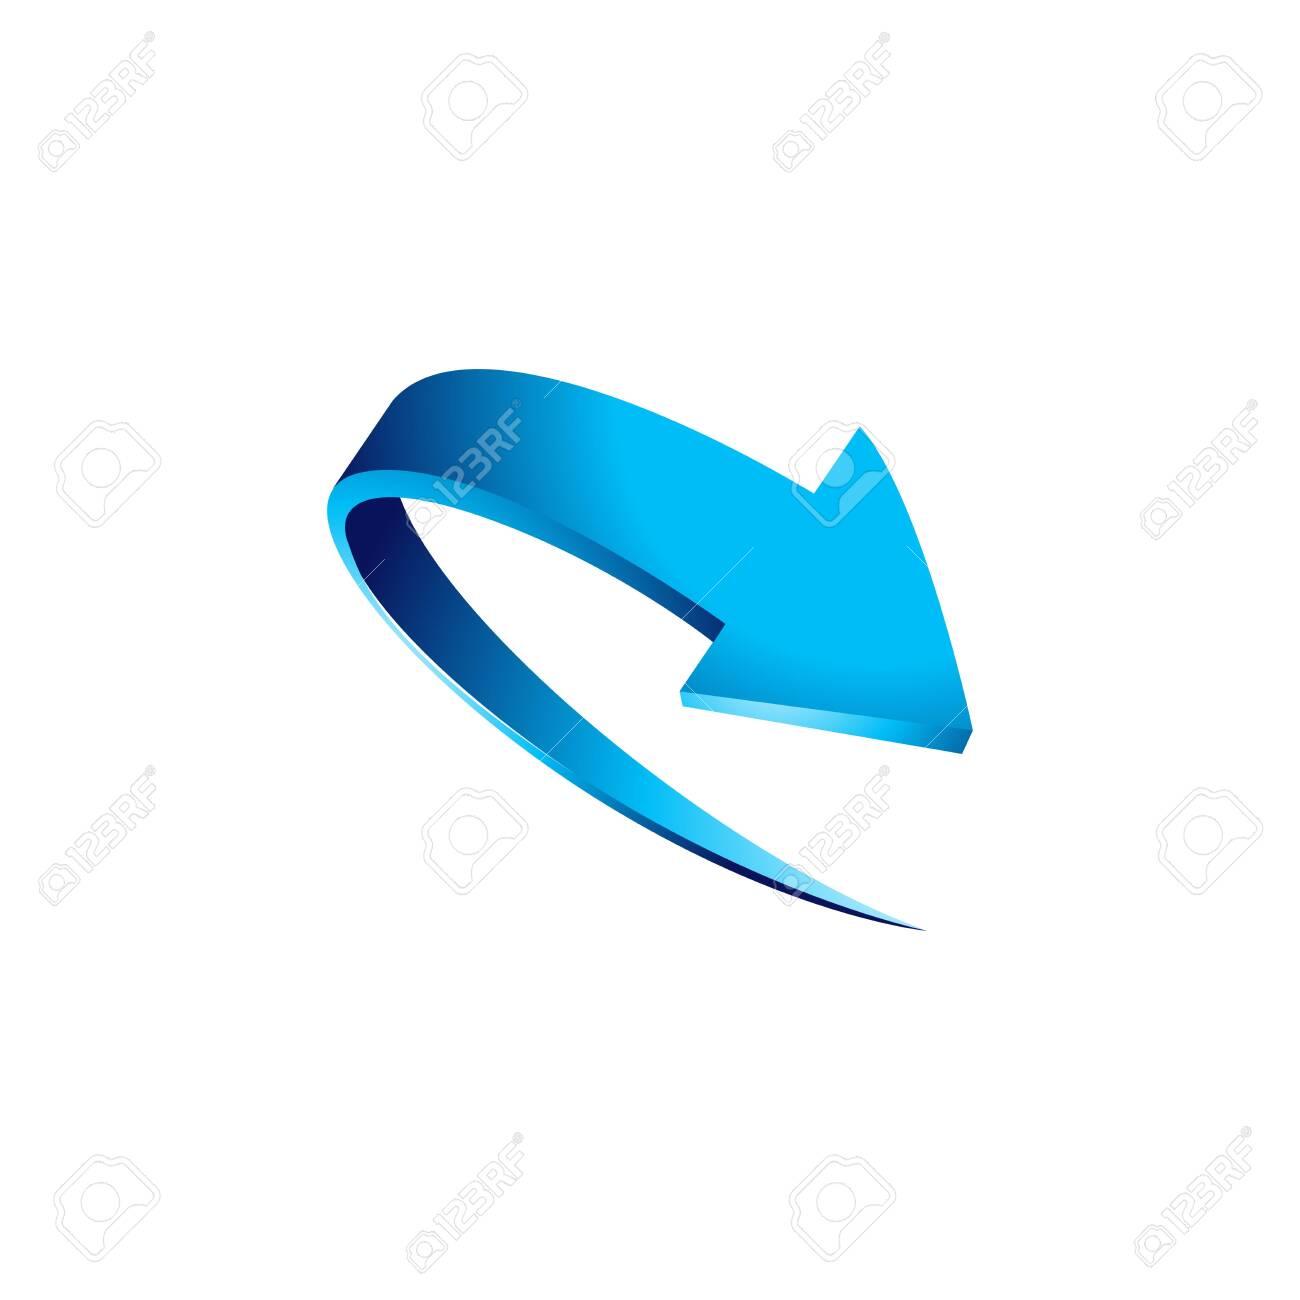 Vector illustration of 3d arrow design - 129792586